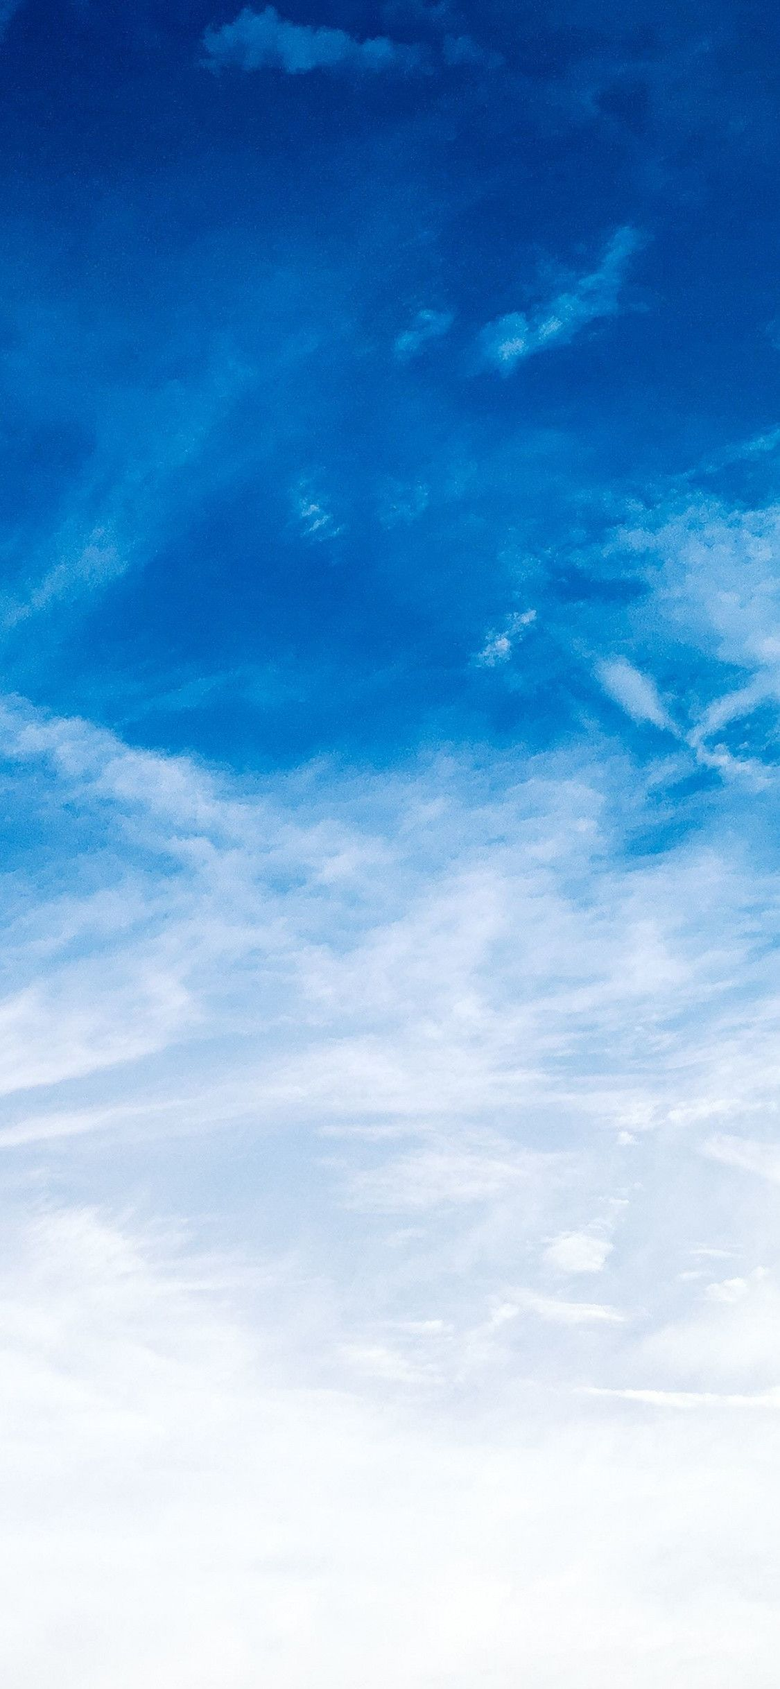 Sky wallpapers iphone